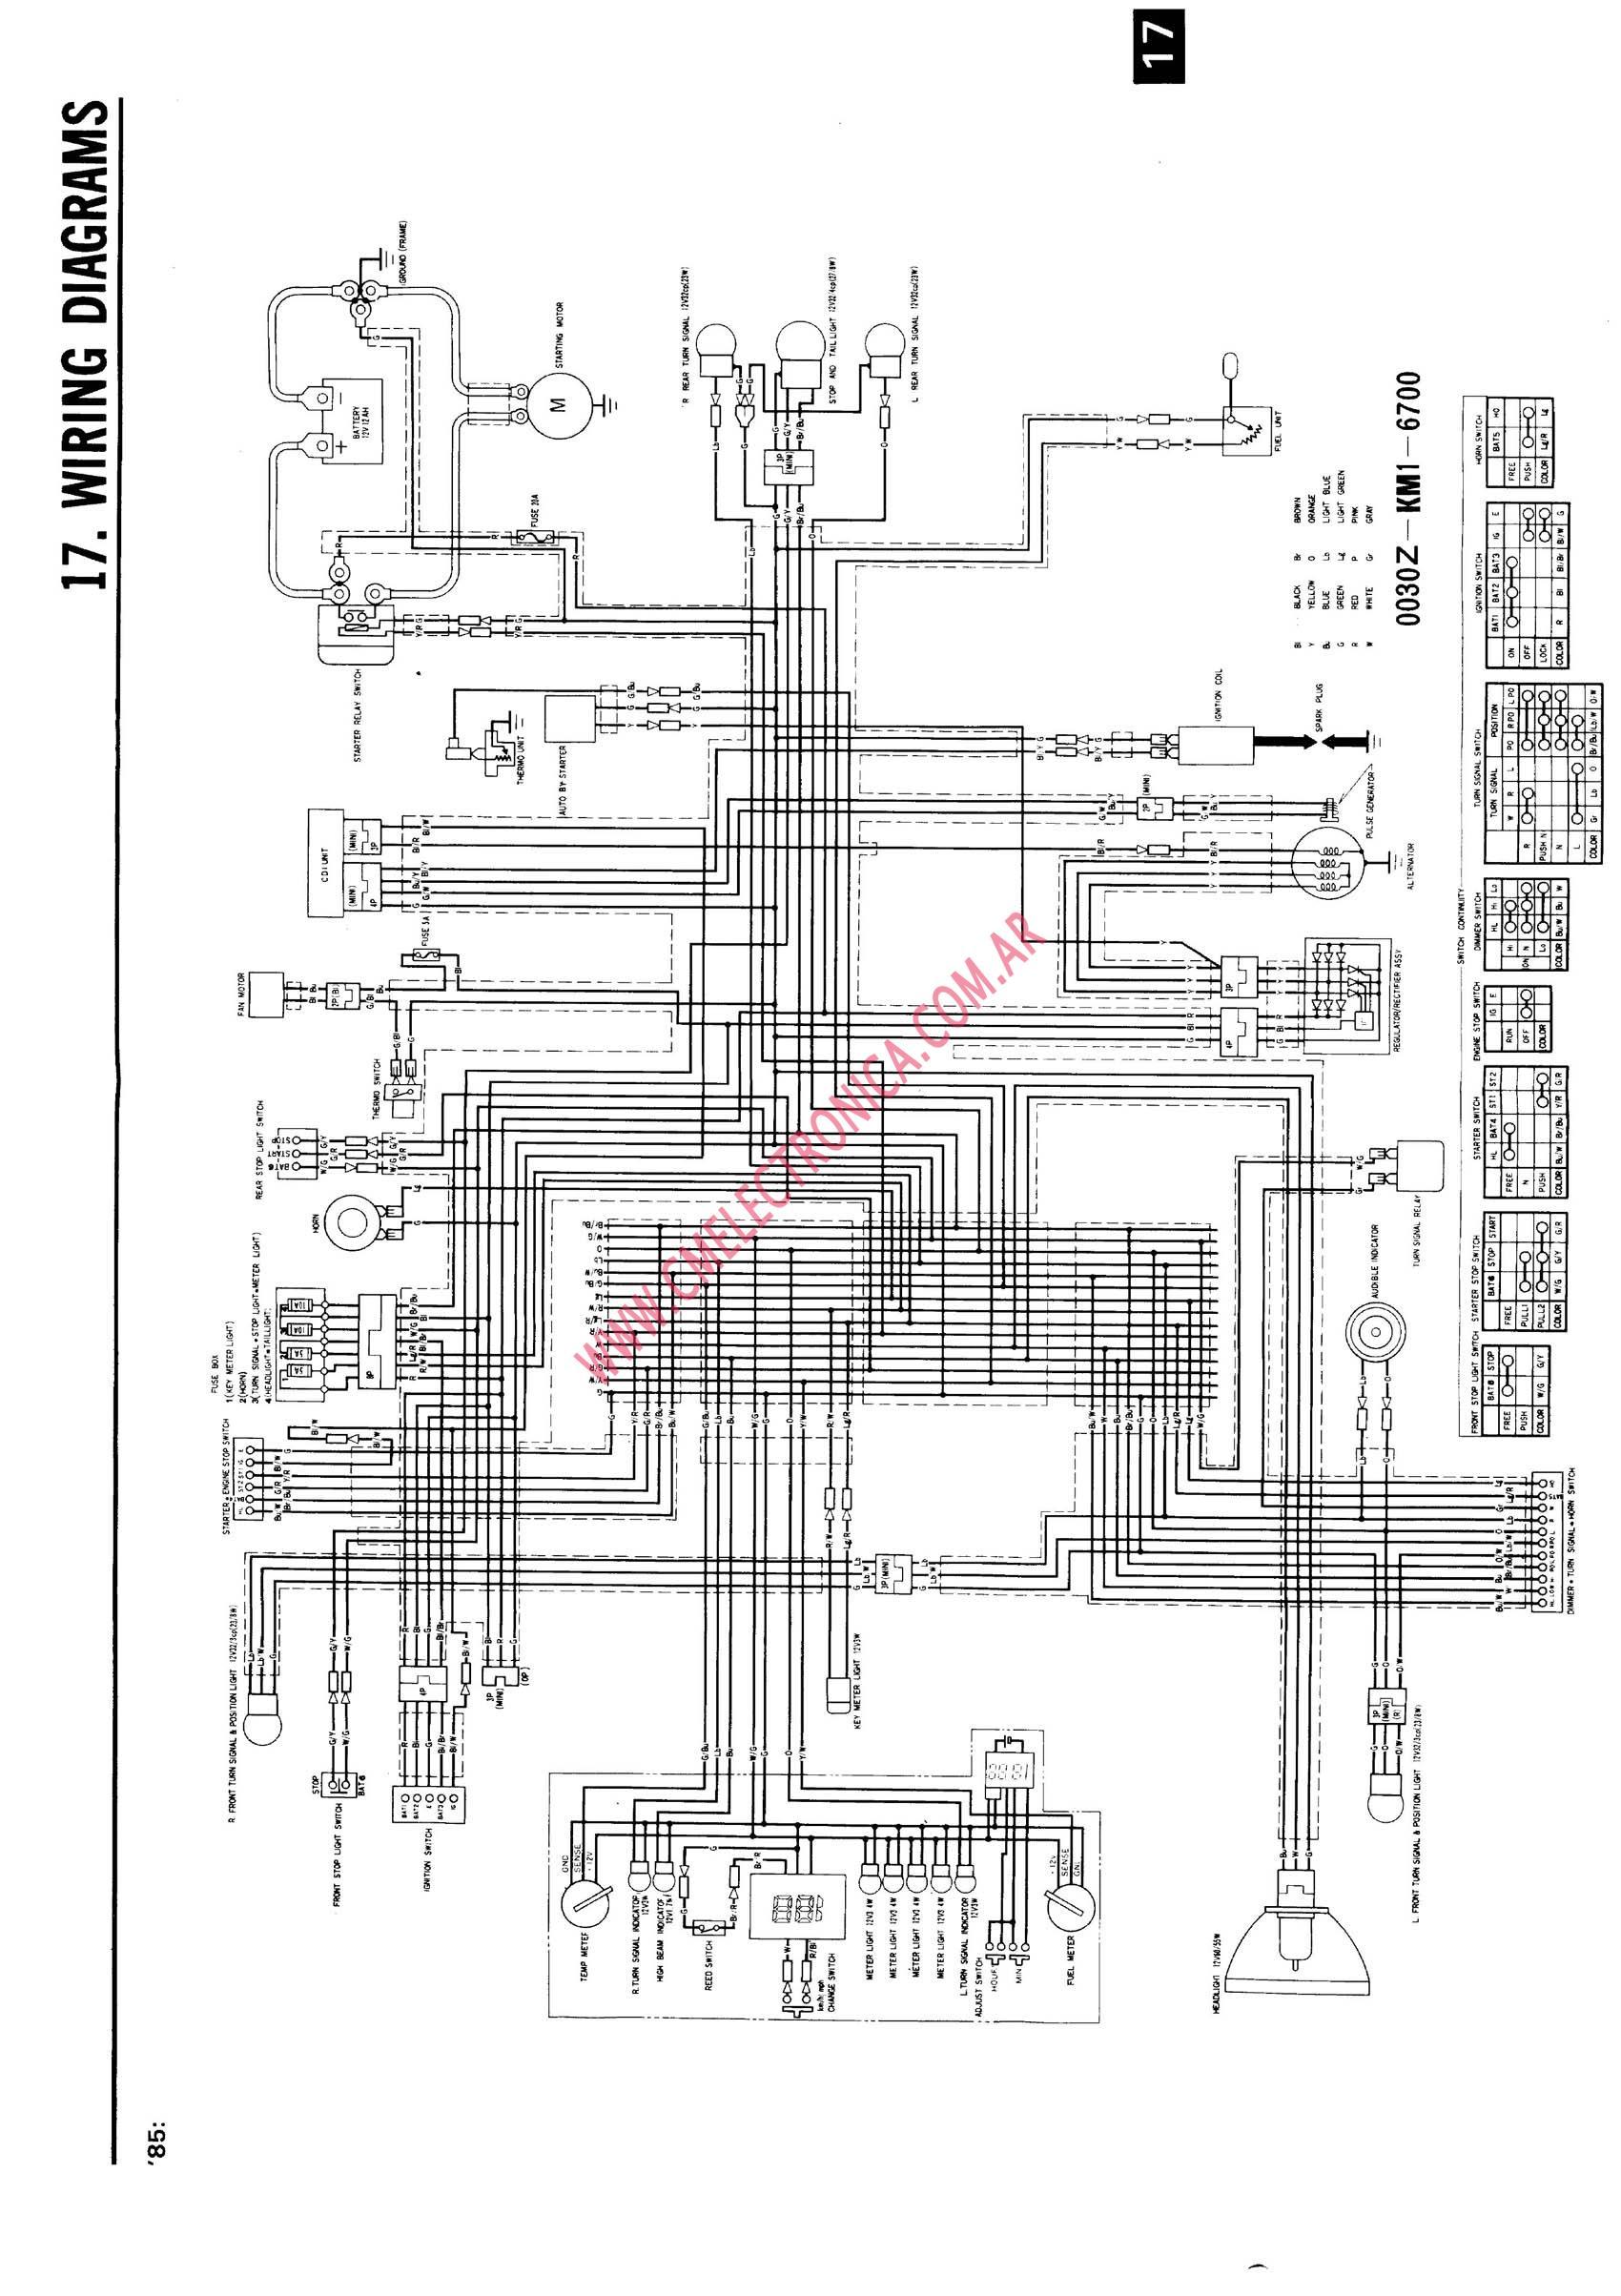 1987 Honda Elite Wiring Diagram